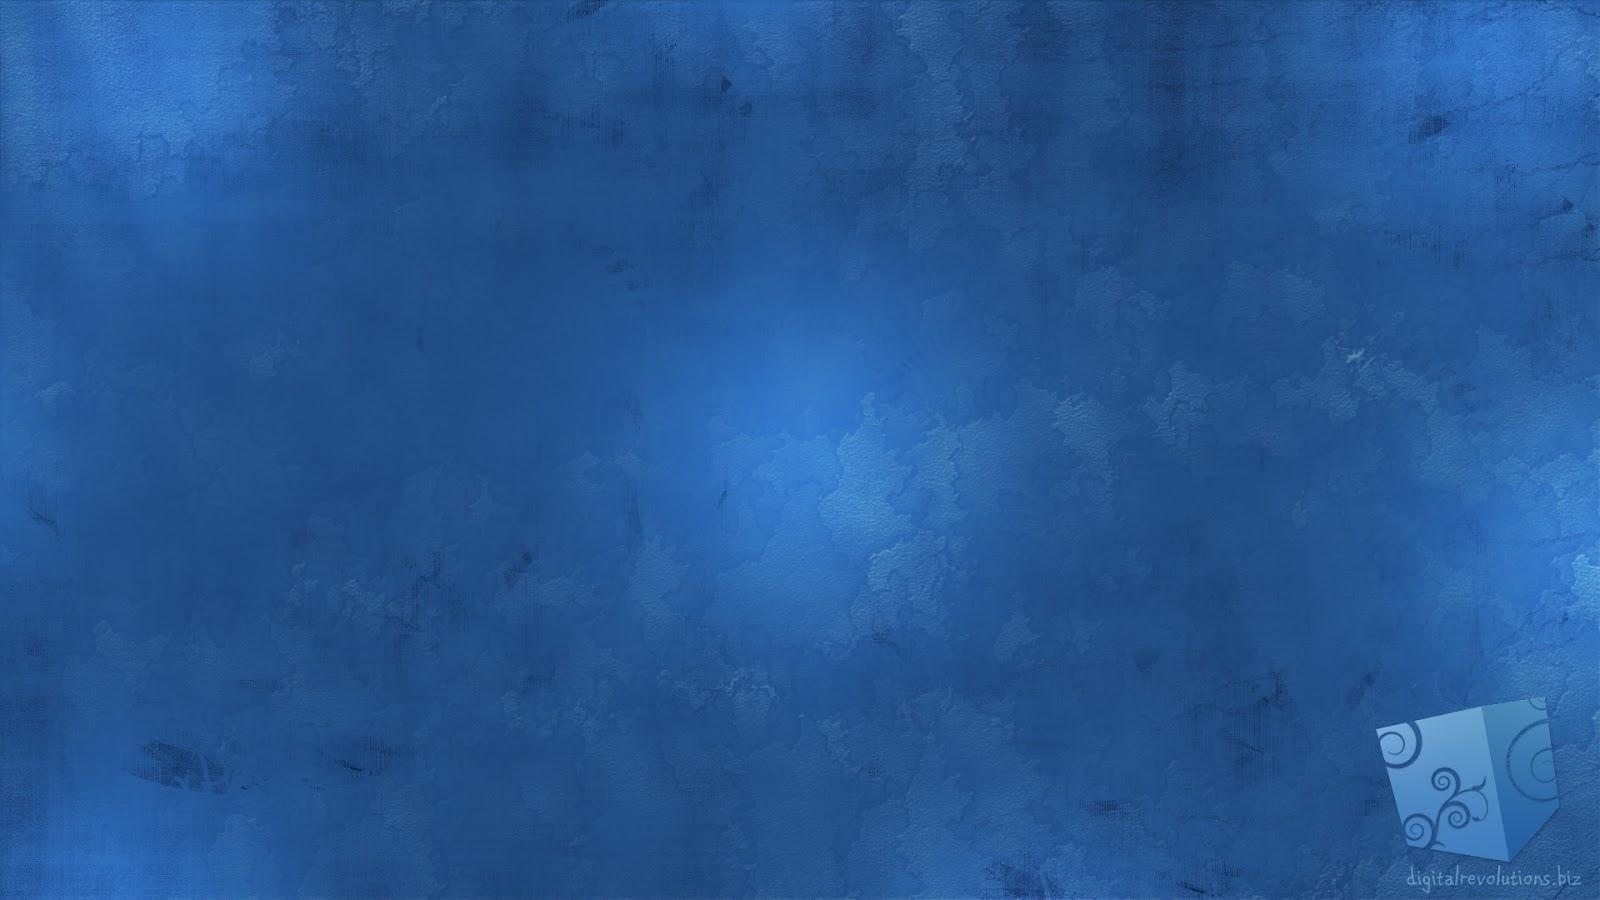 BLUE Art Background Wallpaper Image HD